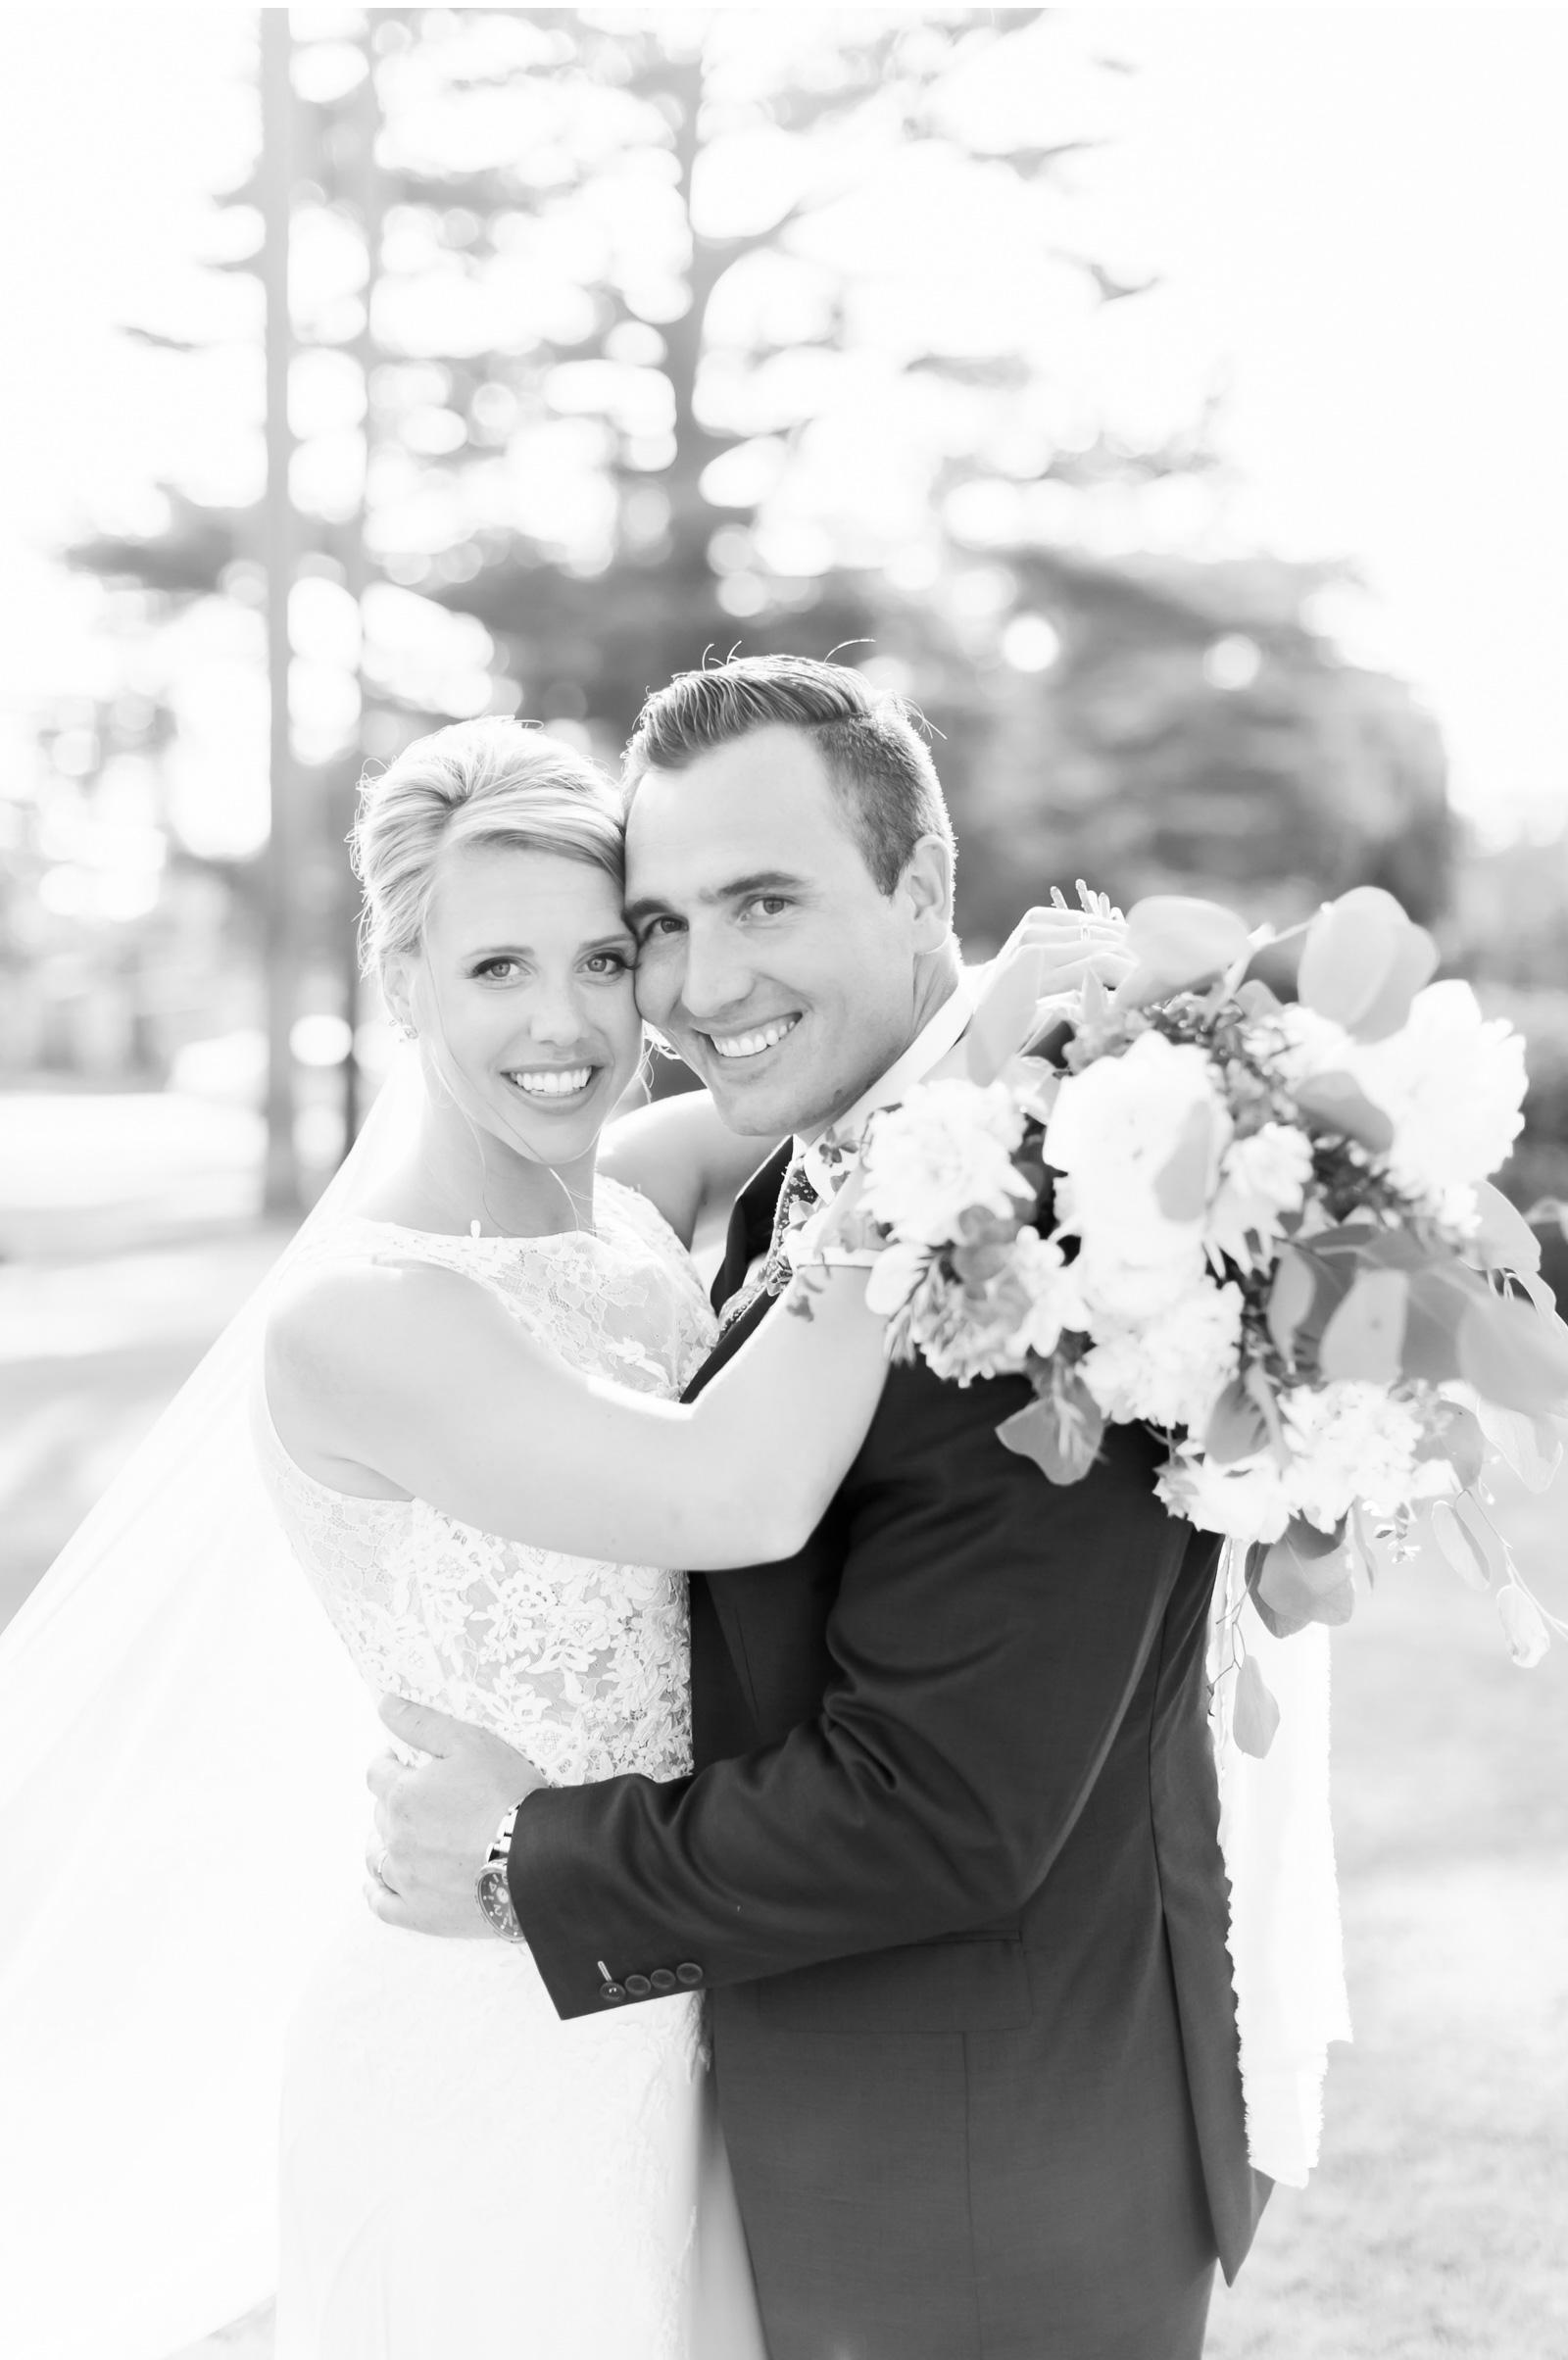 San-Luis-Obispo-Wedding-Photographer-Natalie-Schutt-Photography-Style-Me-Pretty_02.jpg